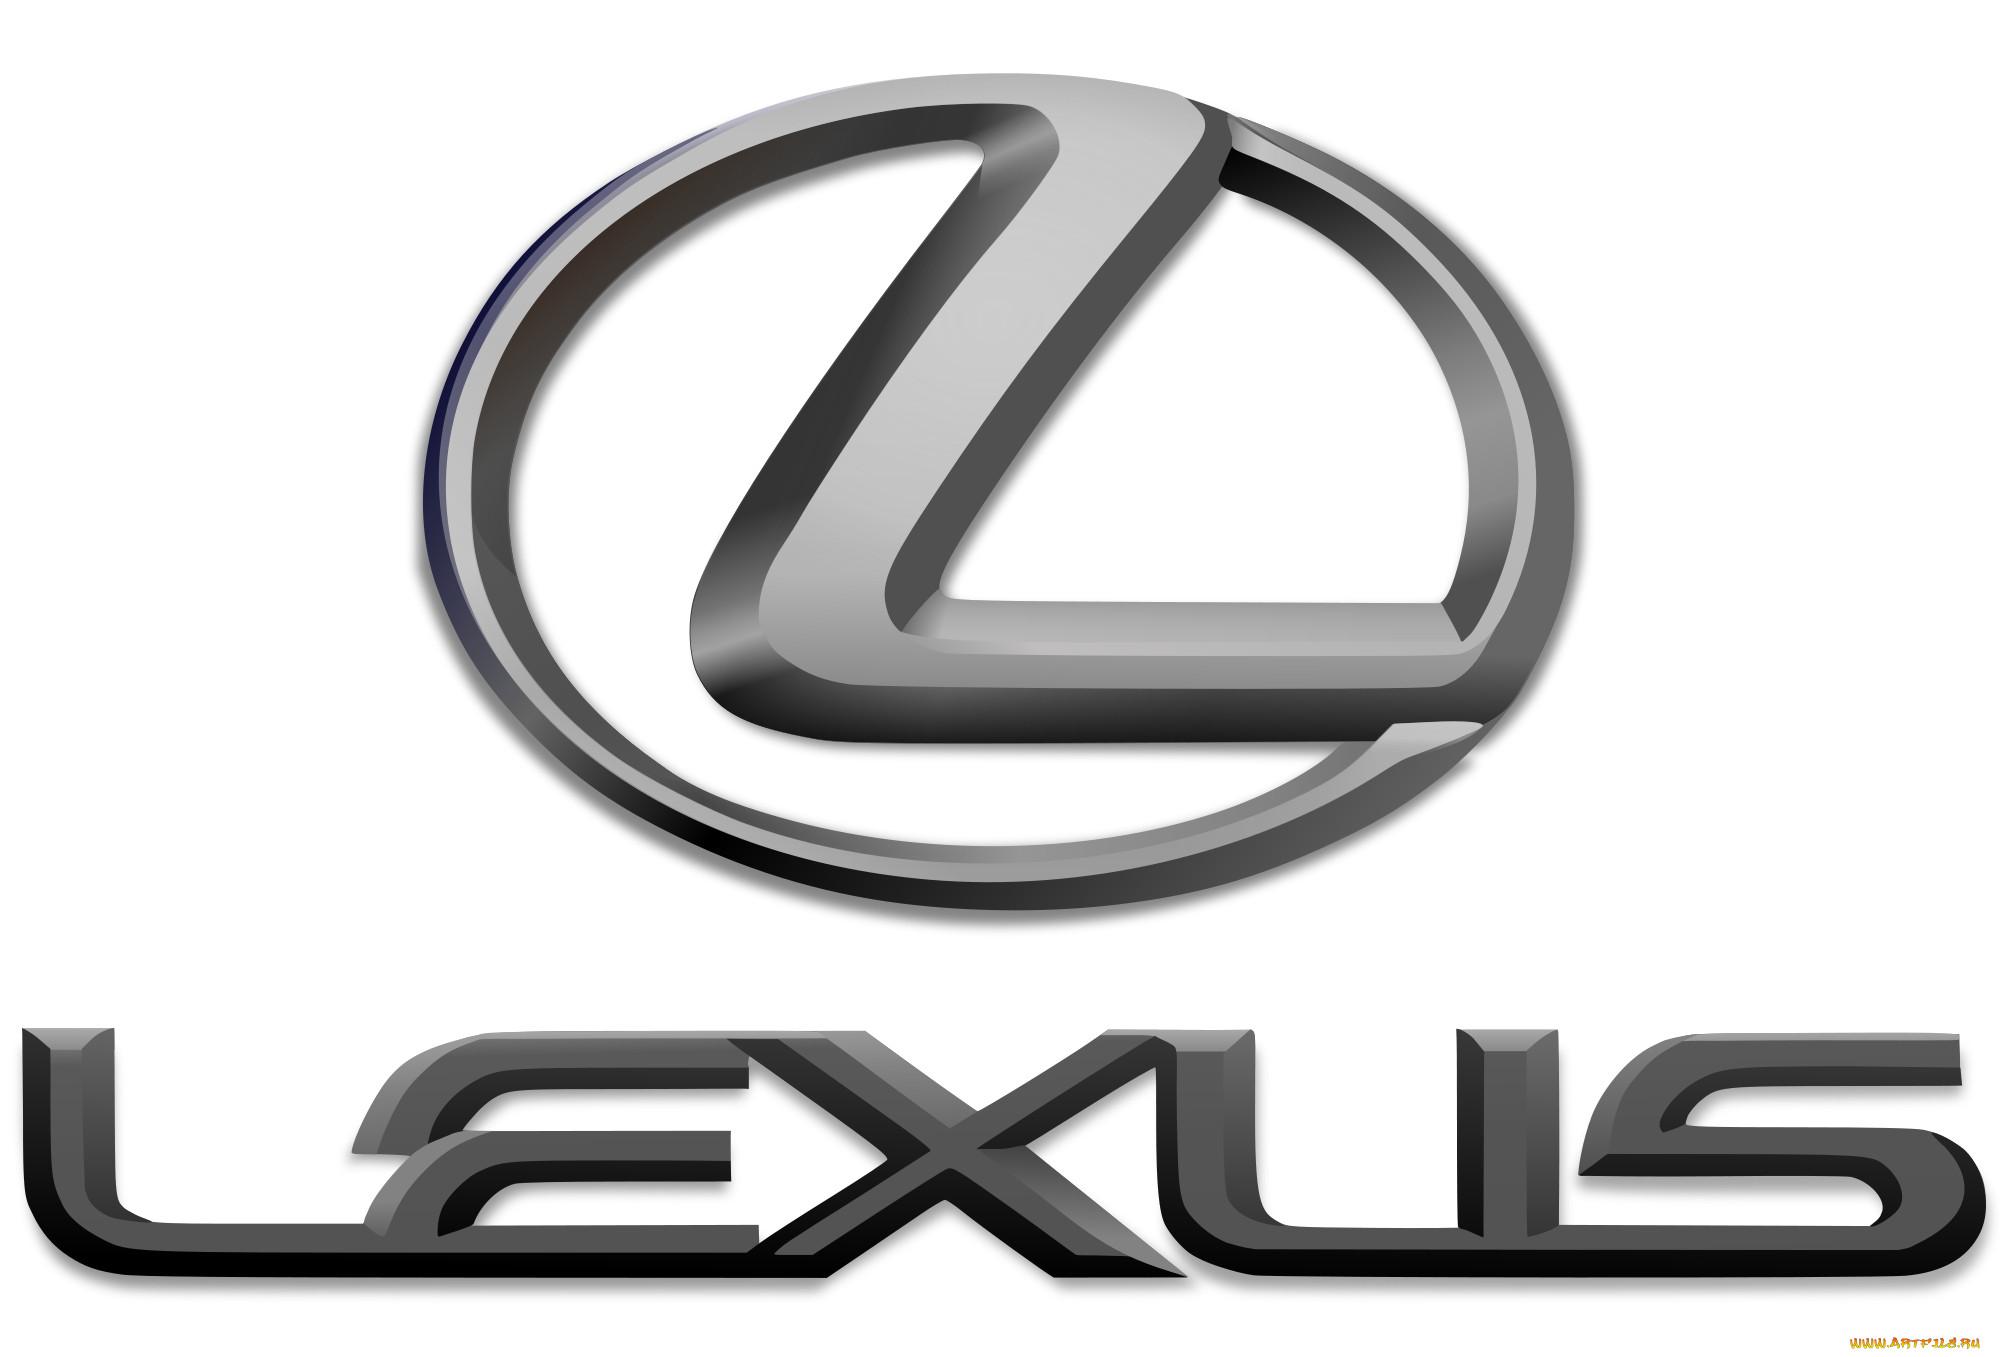 картинки с логотипами машин все эти